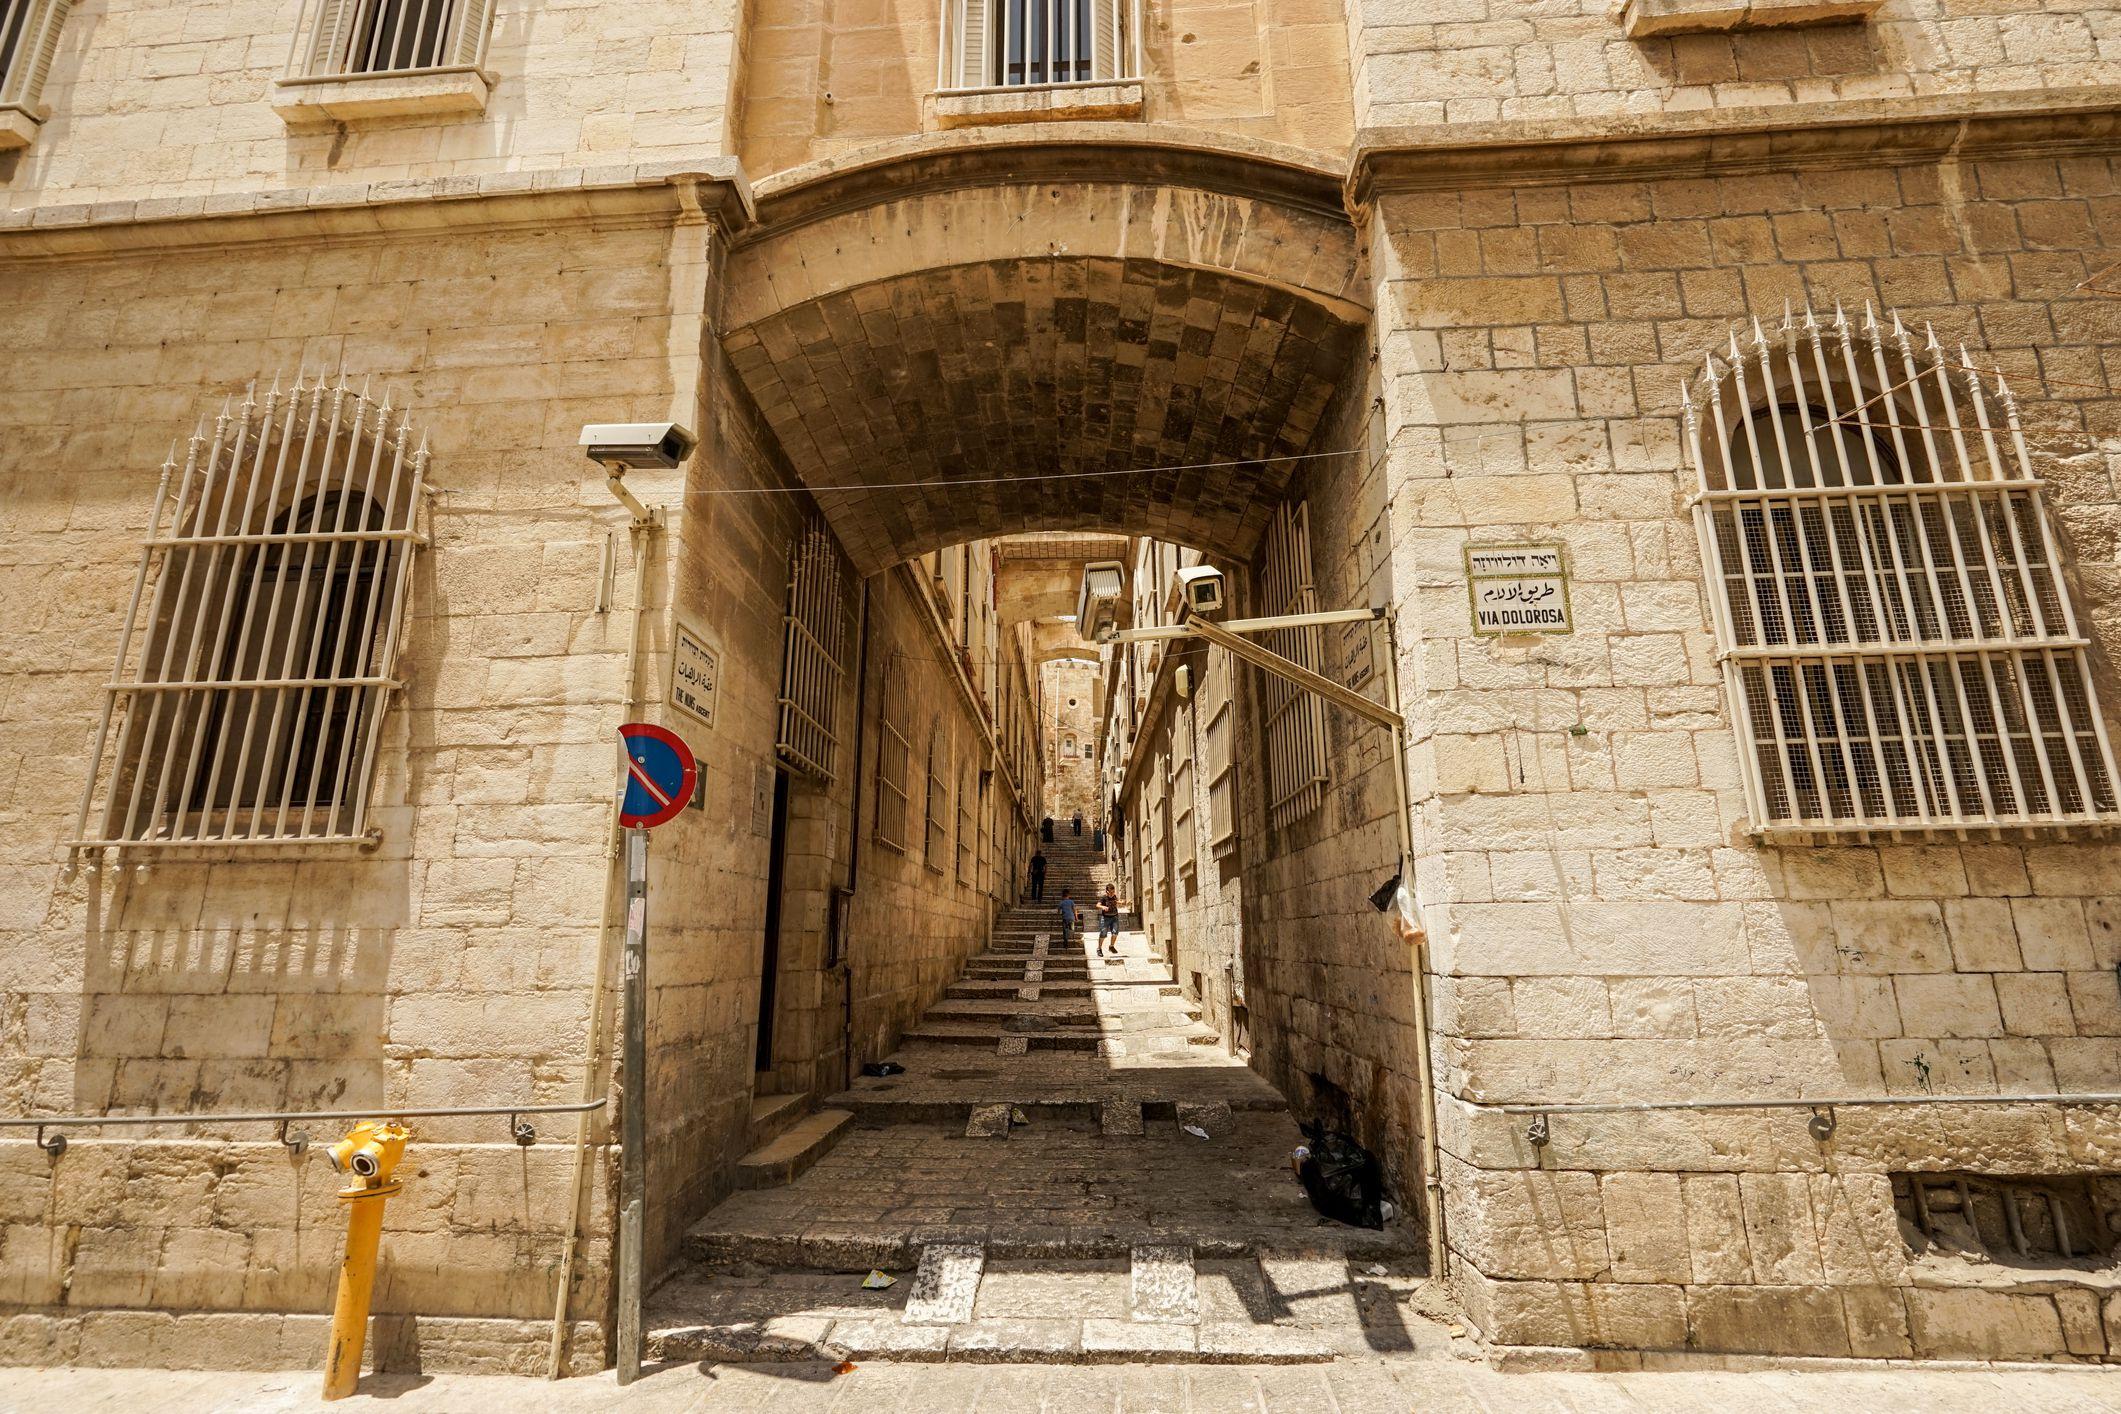 One of the stops on Via Dolorosa in Jerusalem.